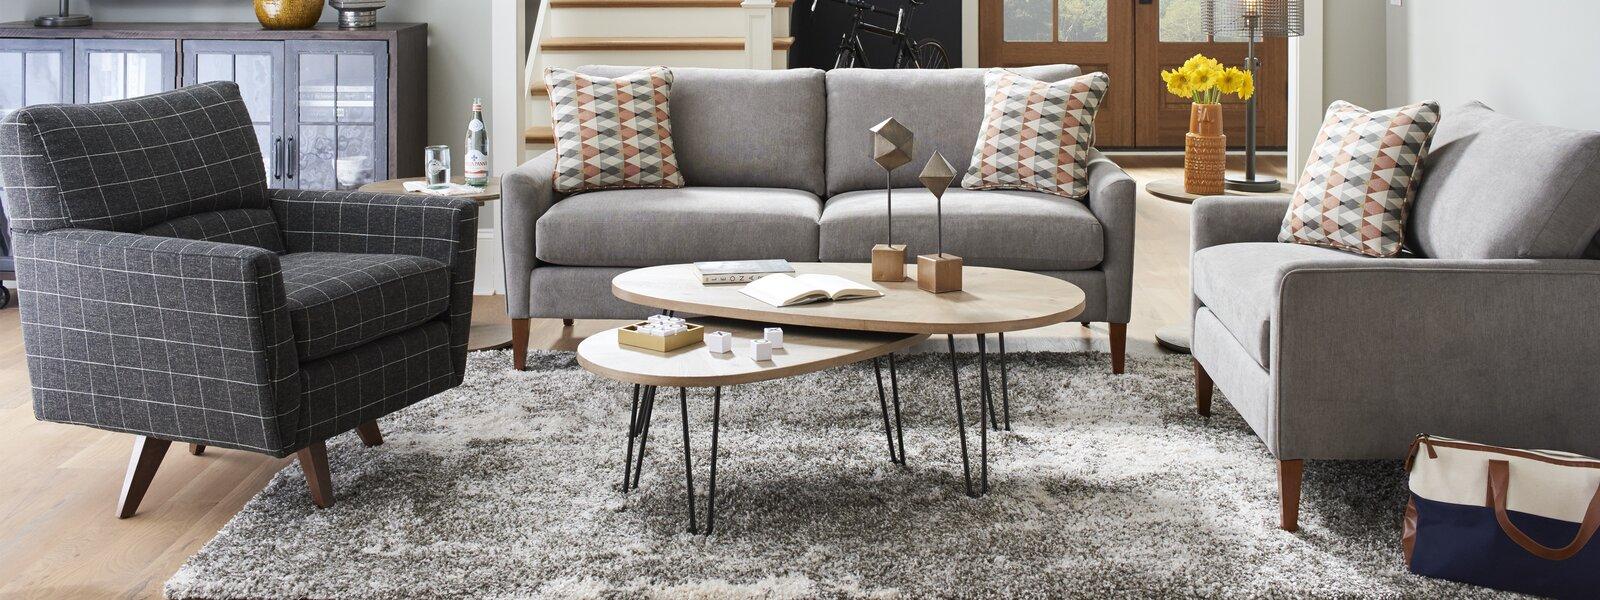 Lazy Boy Living Room Furniture | La Z Boy Wayfair